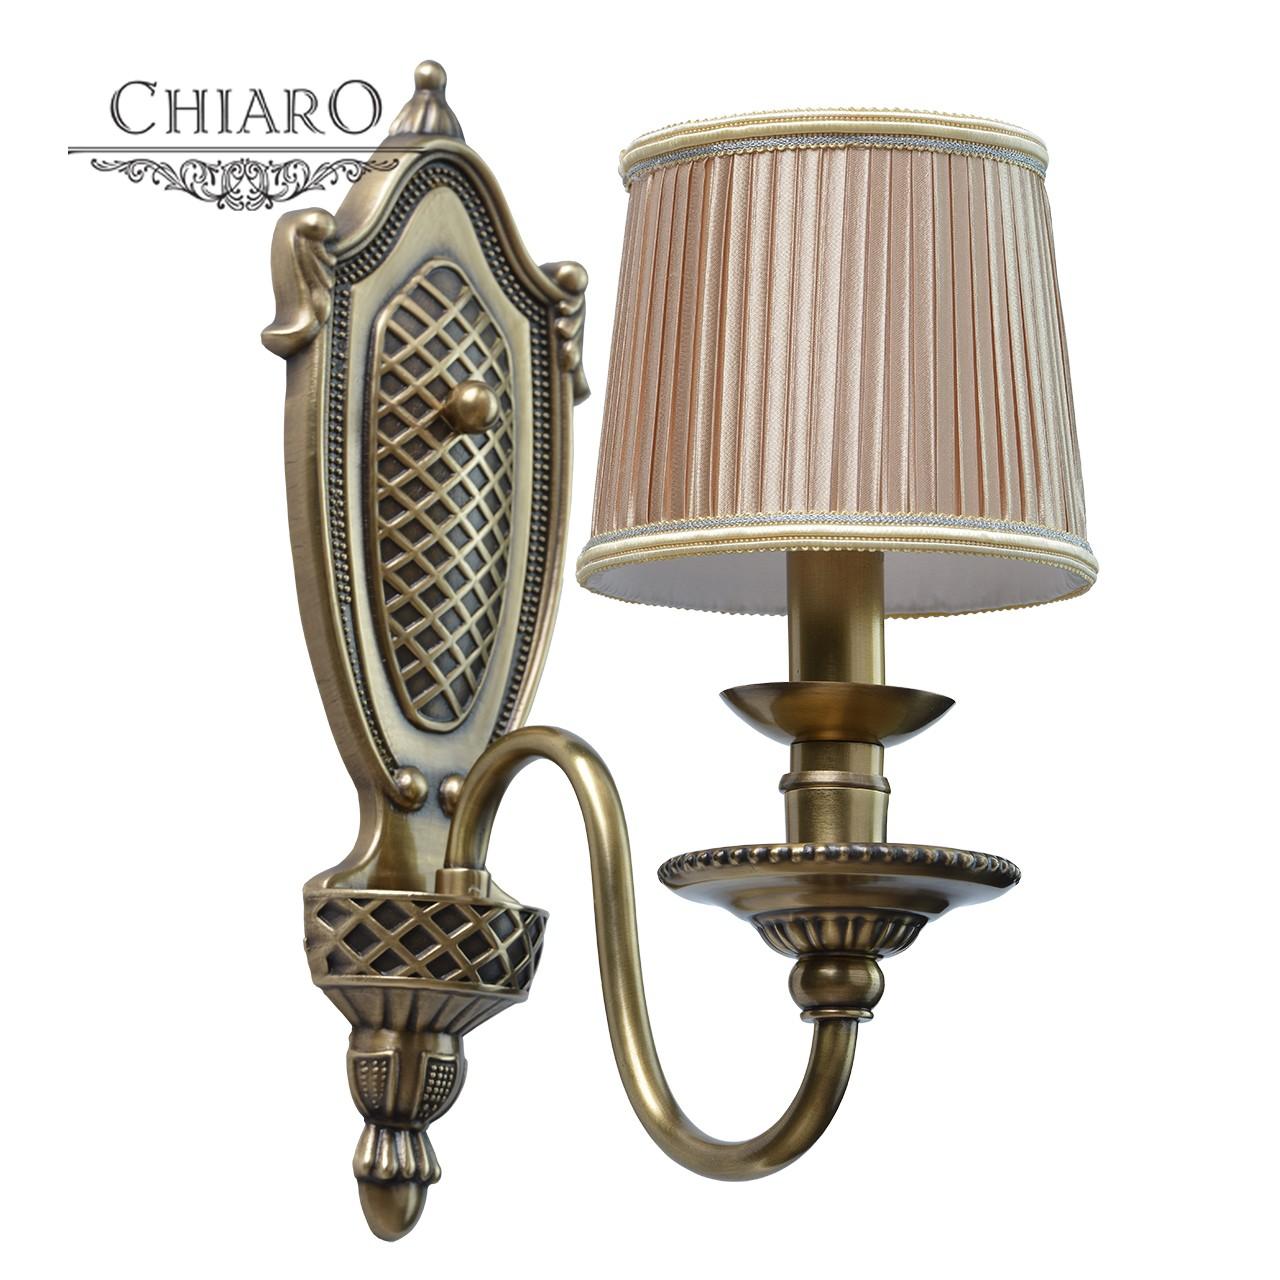 Бра Chiaro Паула 411021101, 1xE14x40W, бронза, бежевый, металл, текстиль - фото 1